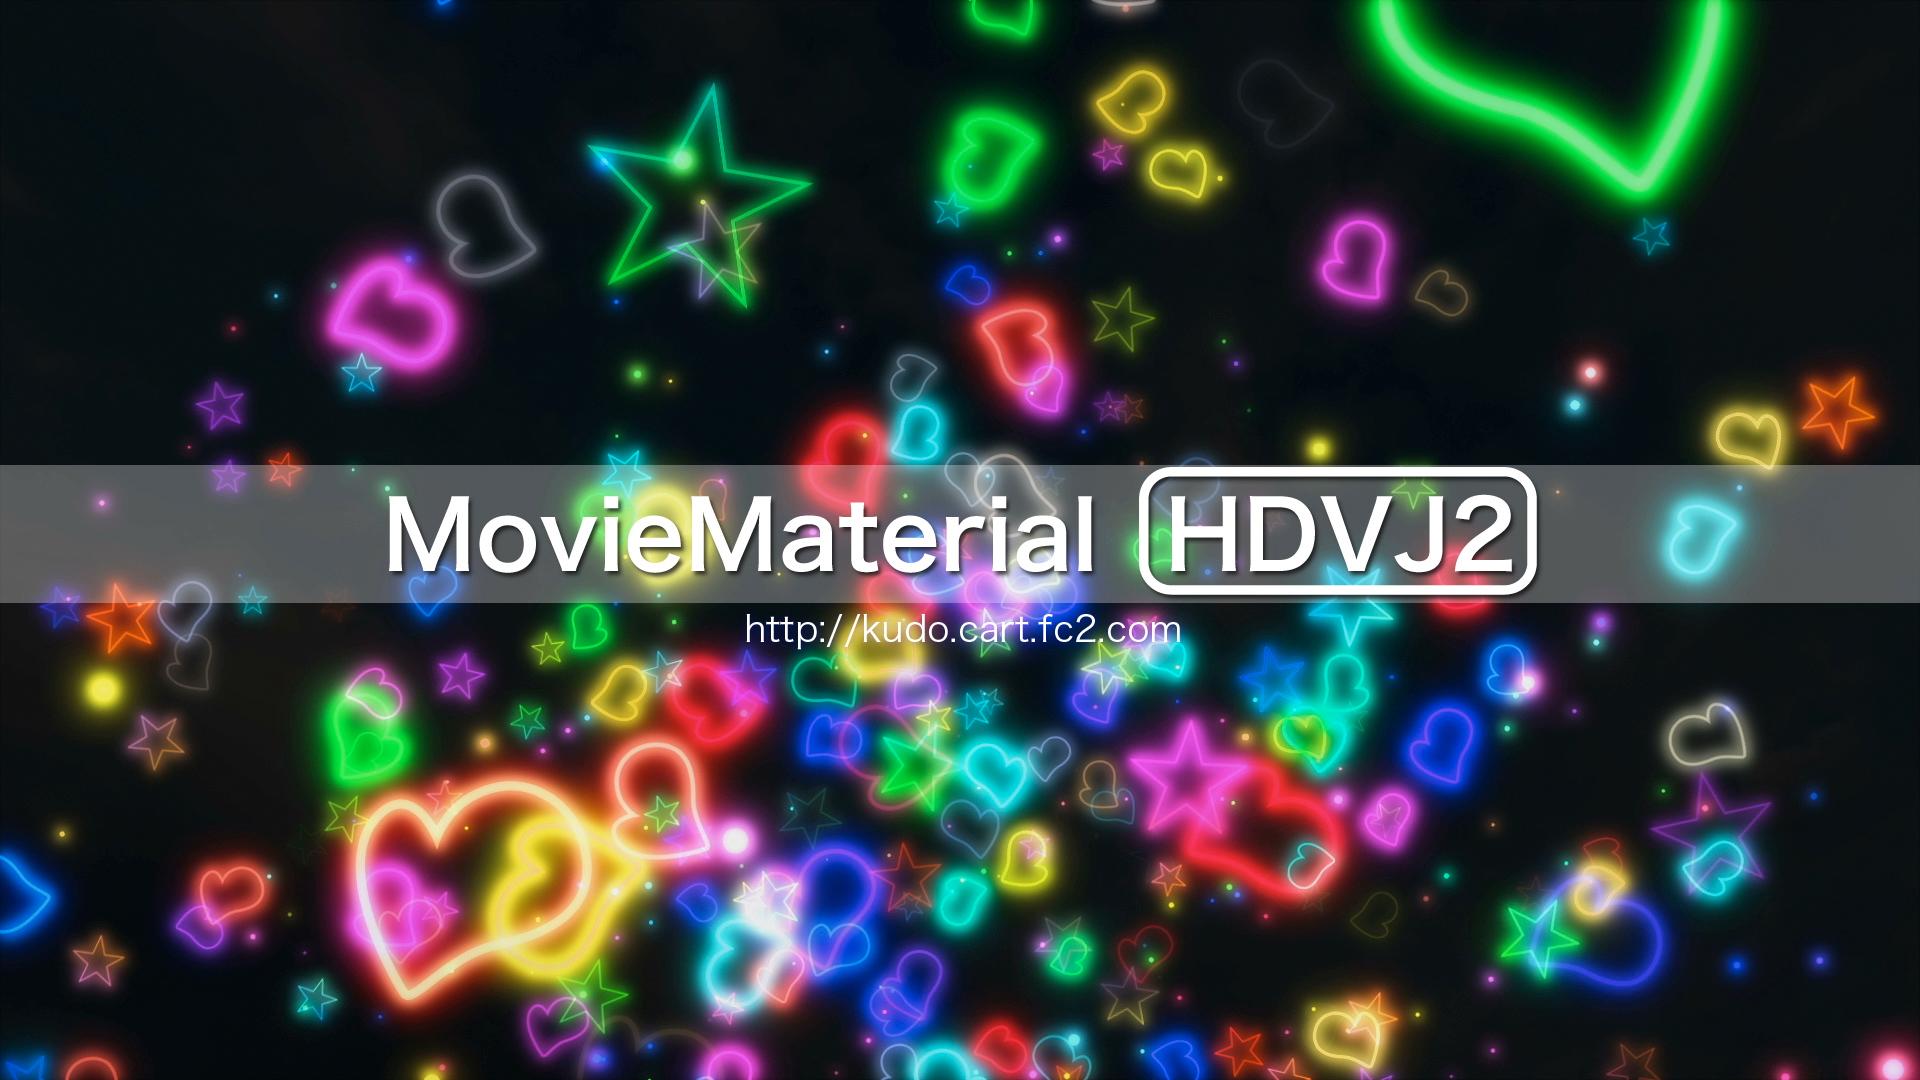 MovieMaterial HDVJ2 フルハイビジョンVJ動画素材集 画像3